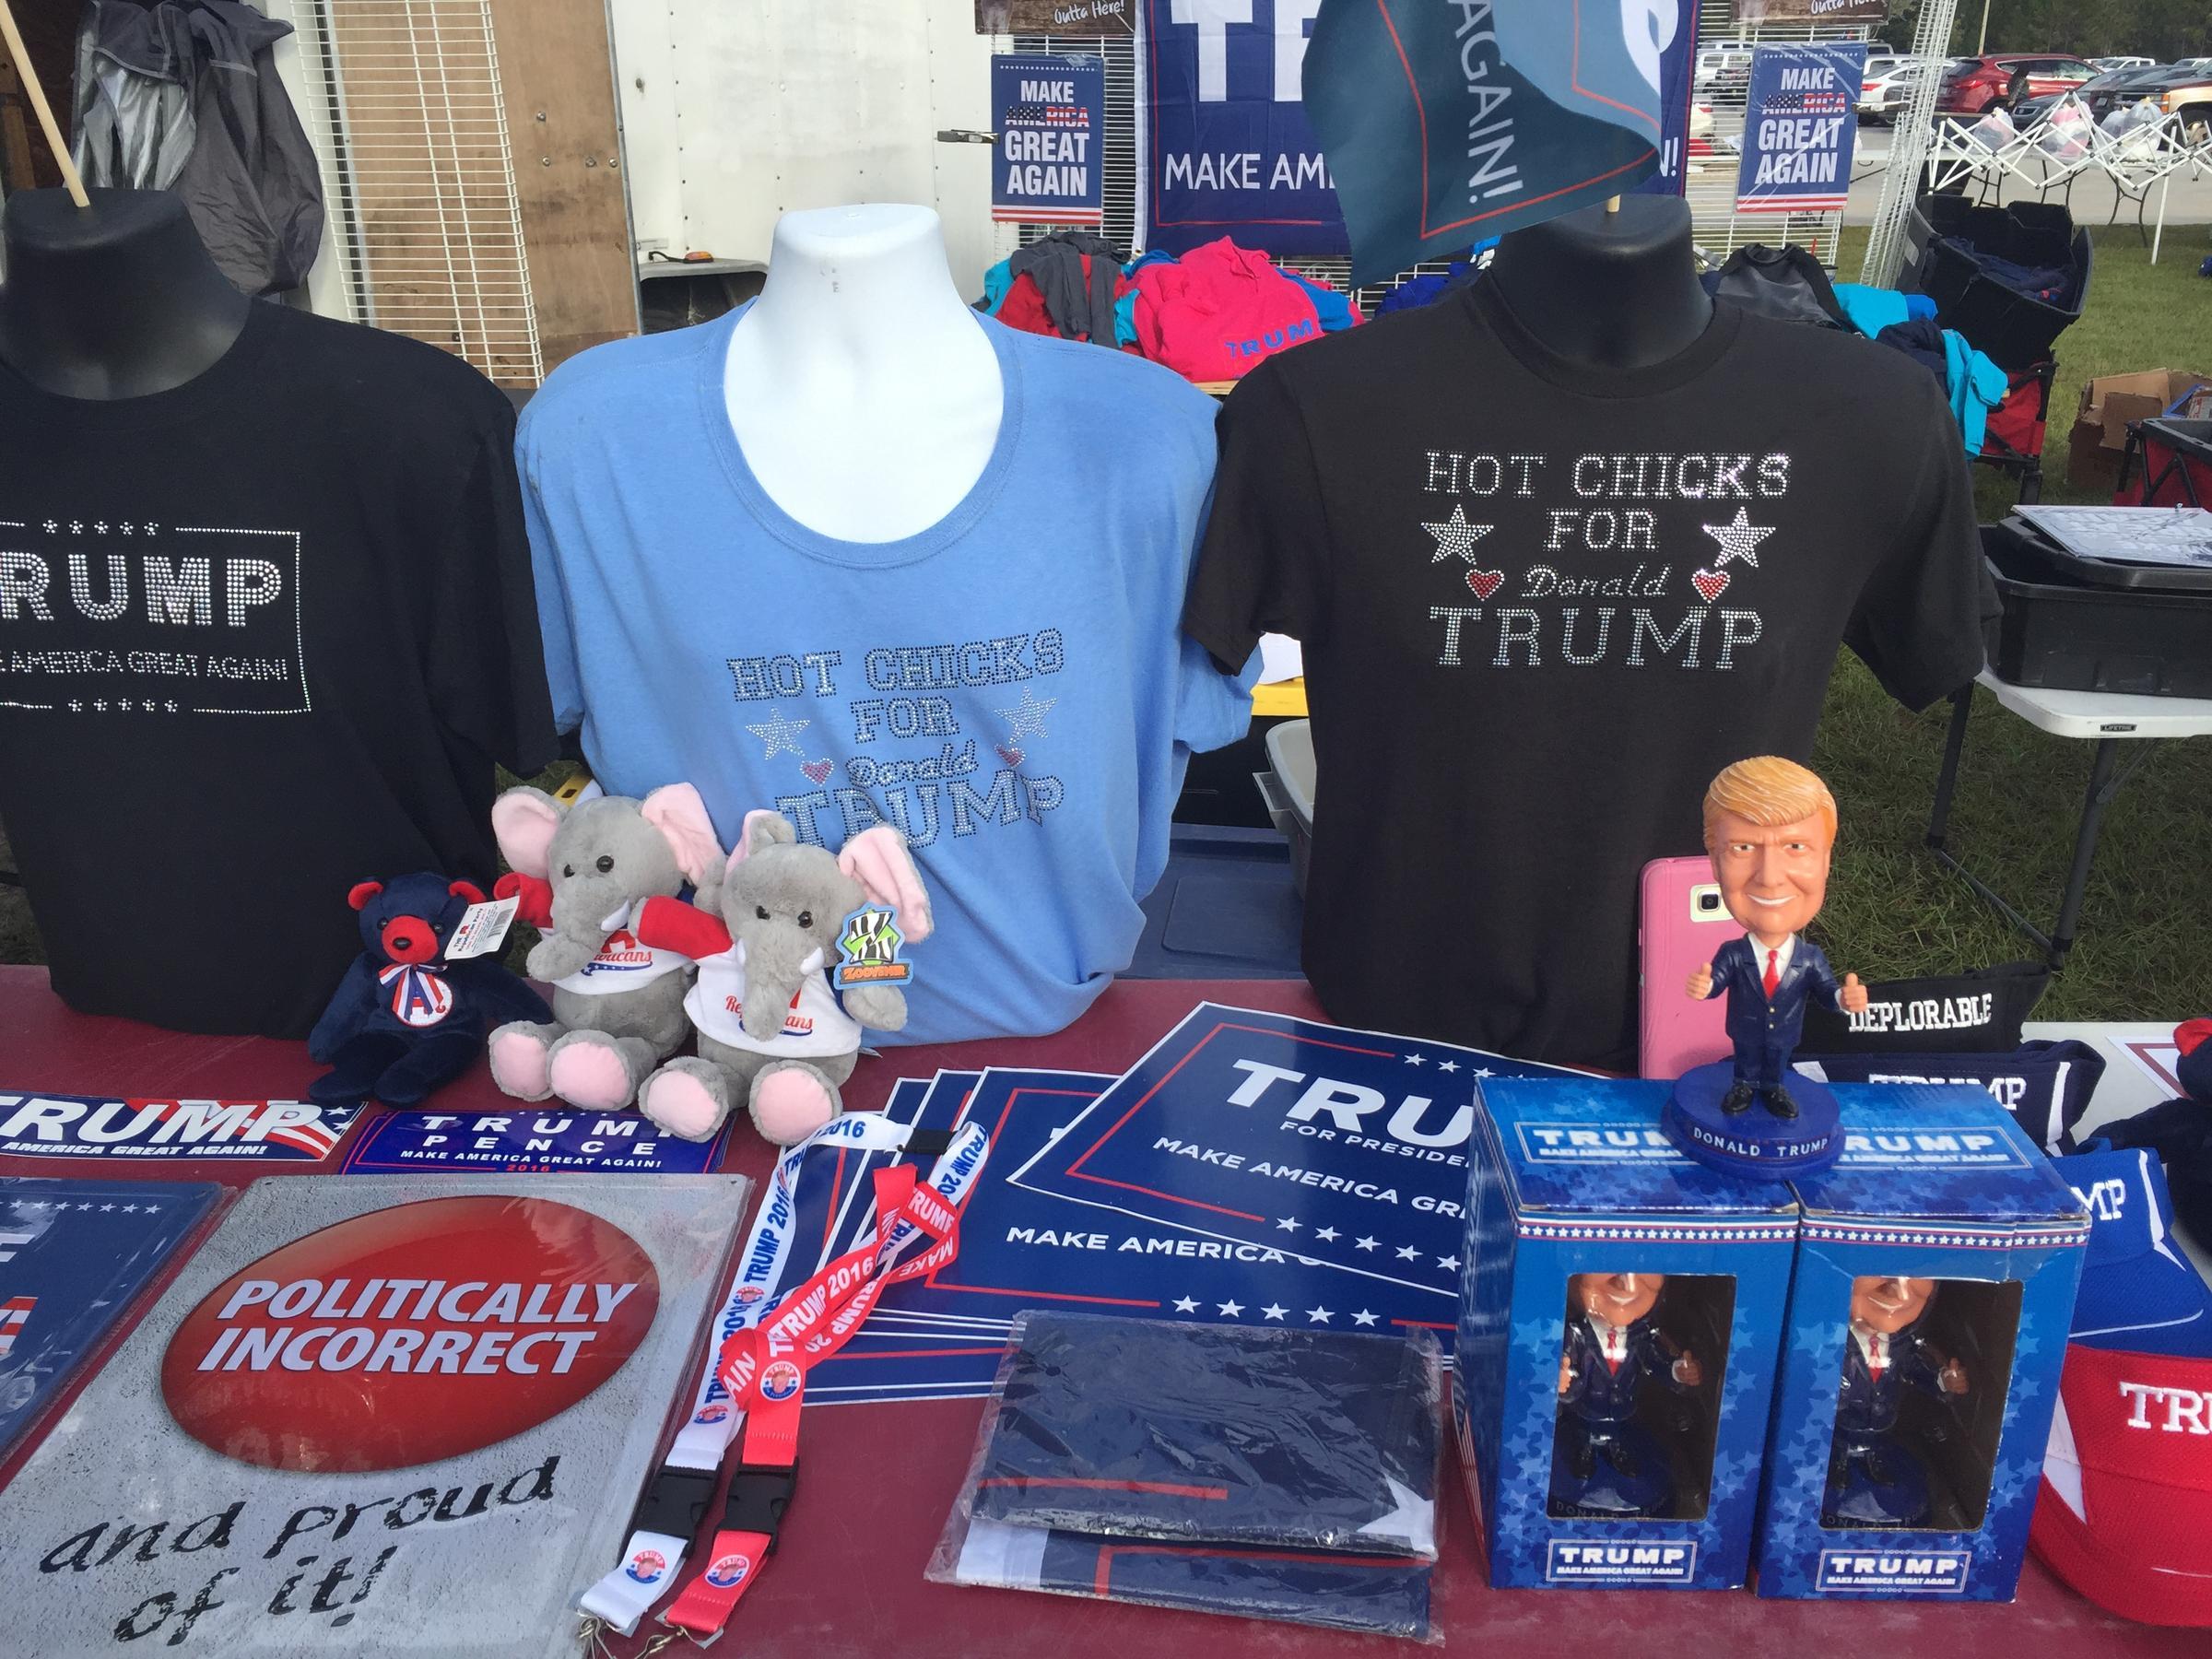 T shirt design jacksonville fl - Trump Gear Is For Sale Outside The Jacksonville Rally